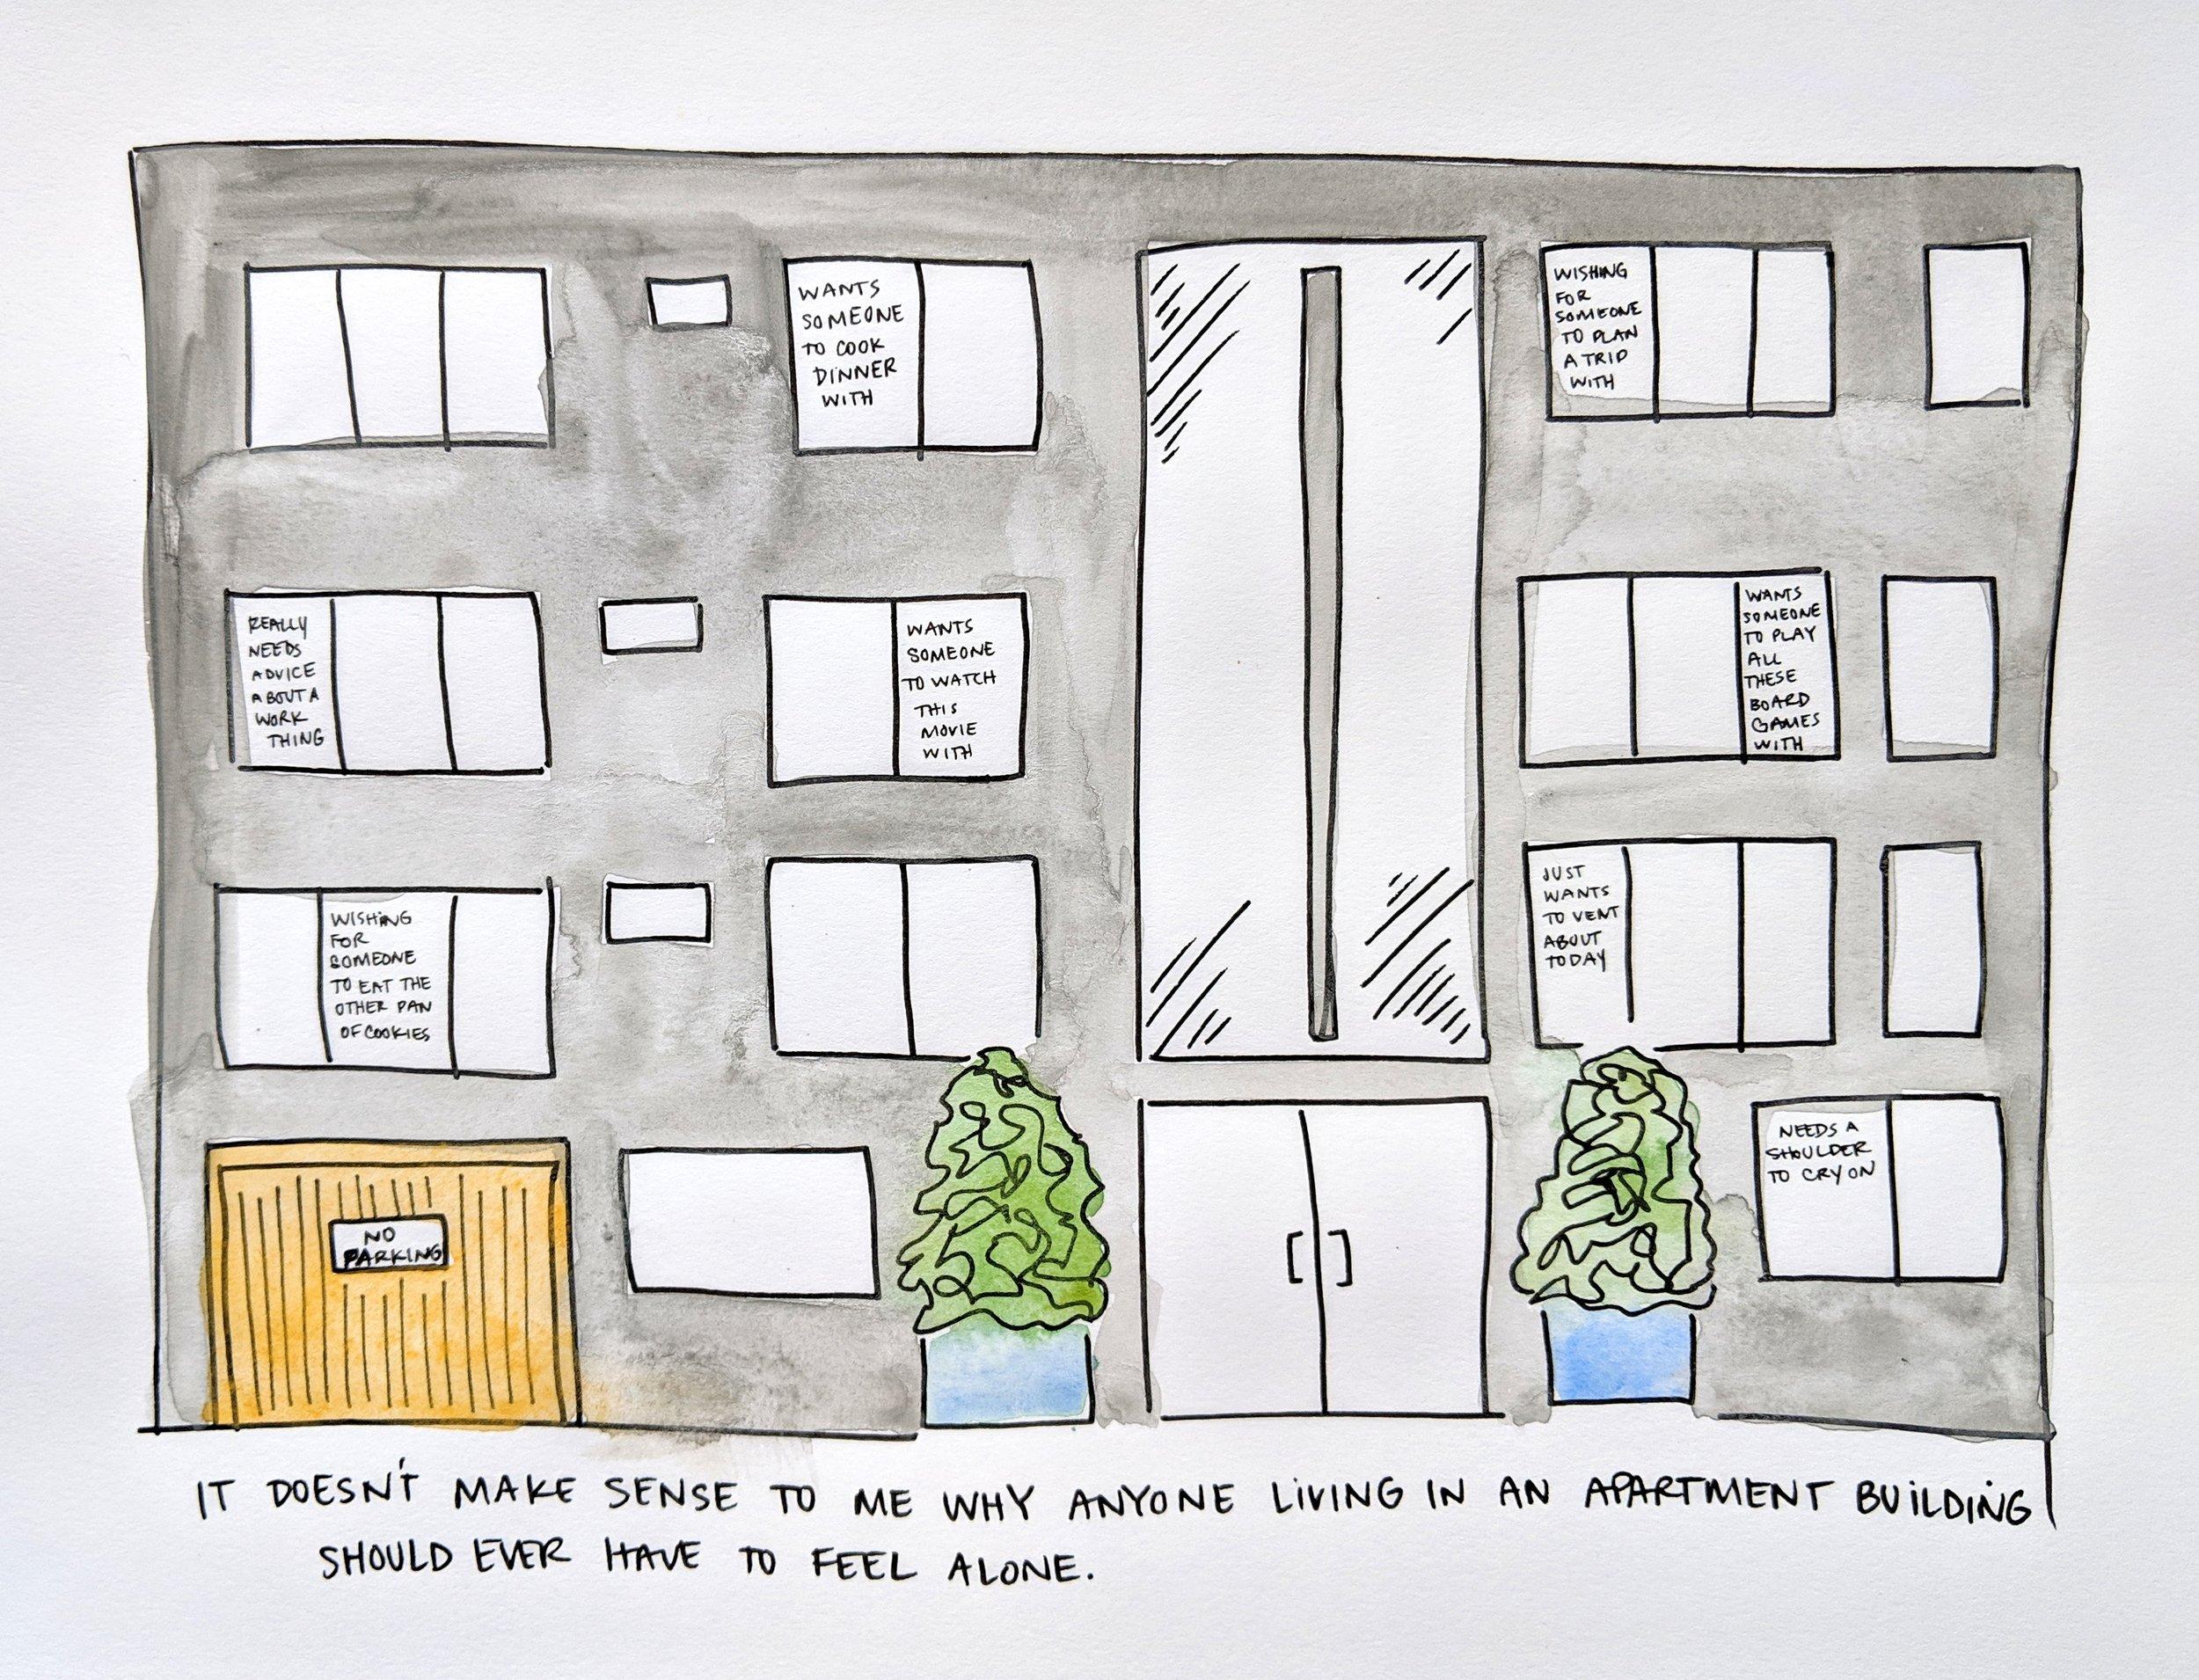 apartment-lonely-katvellos.jpg